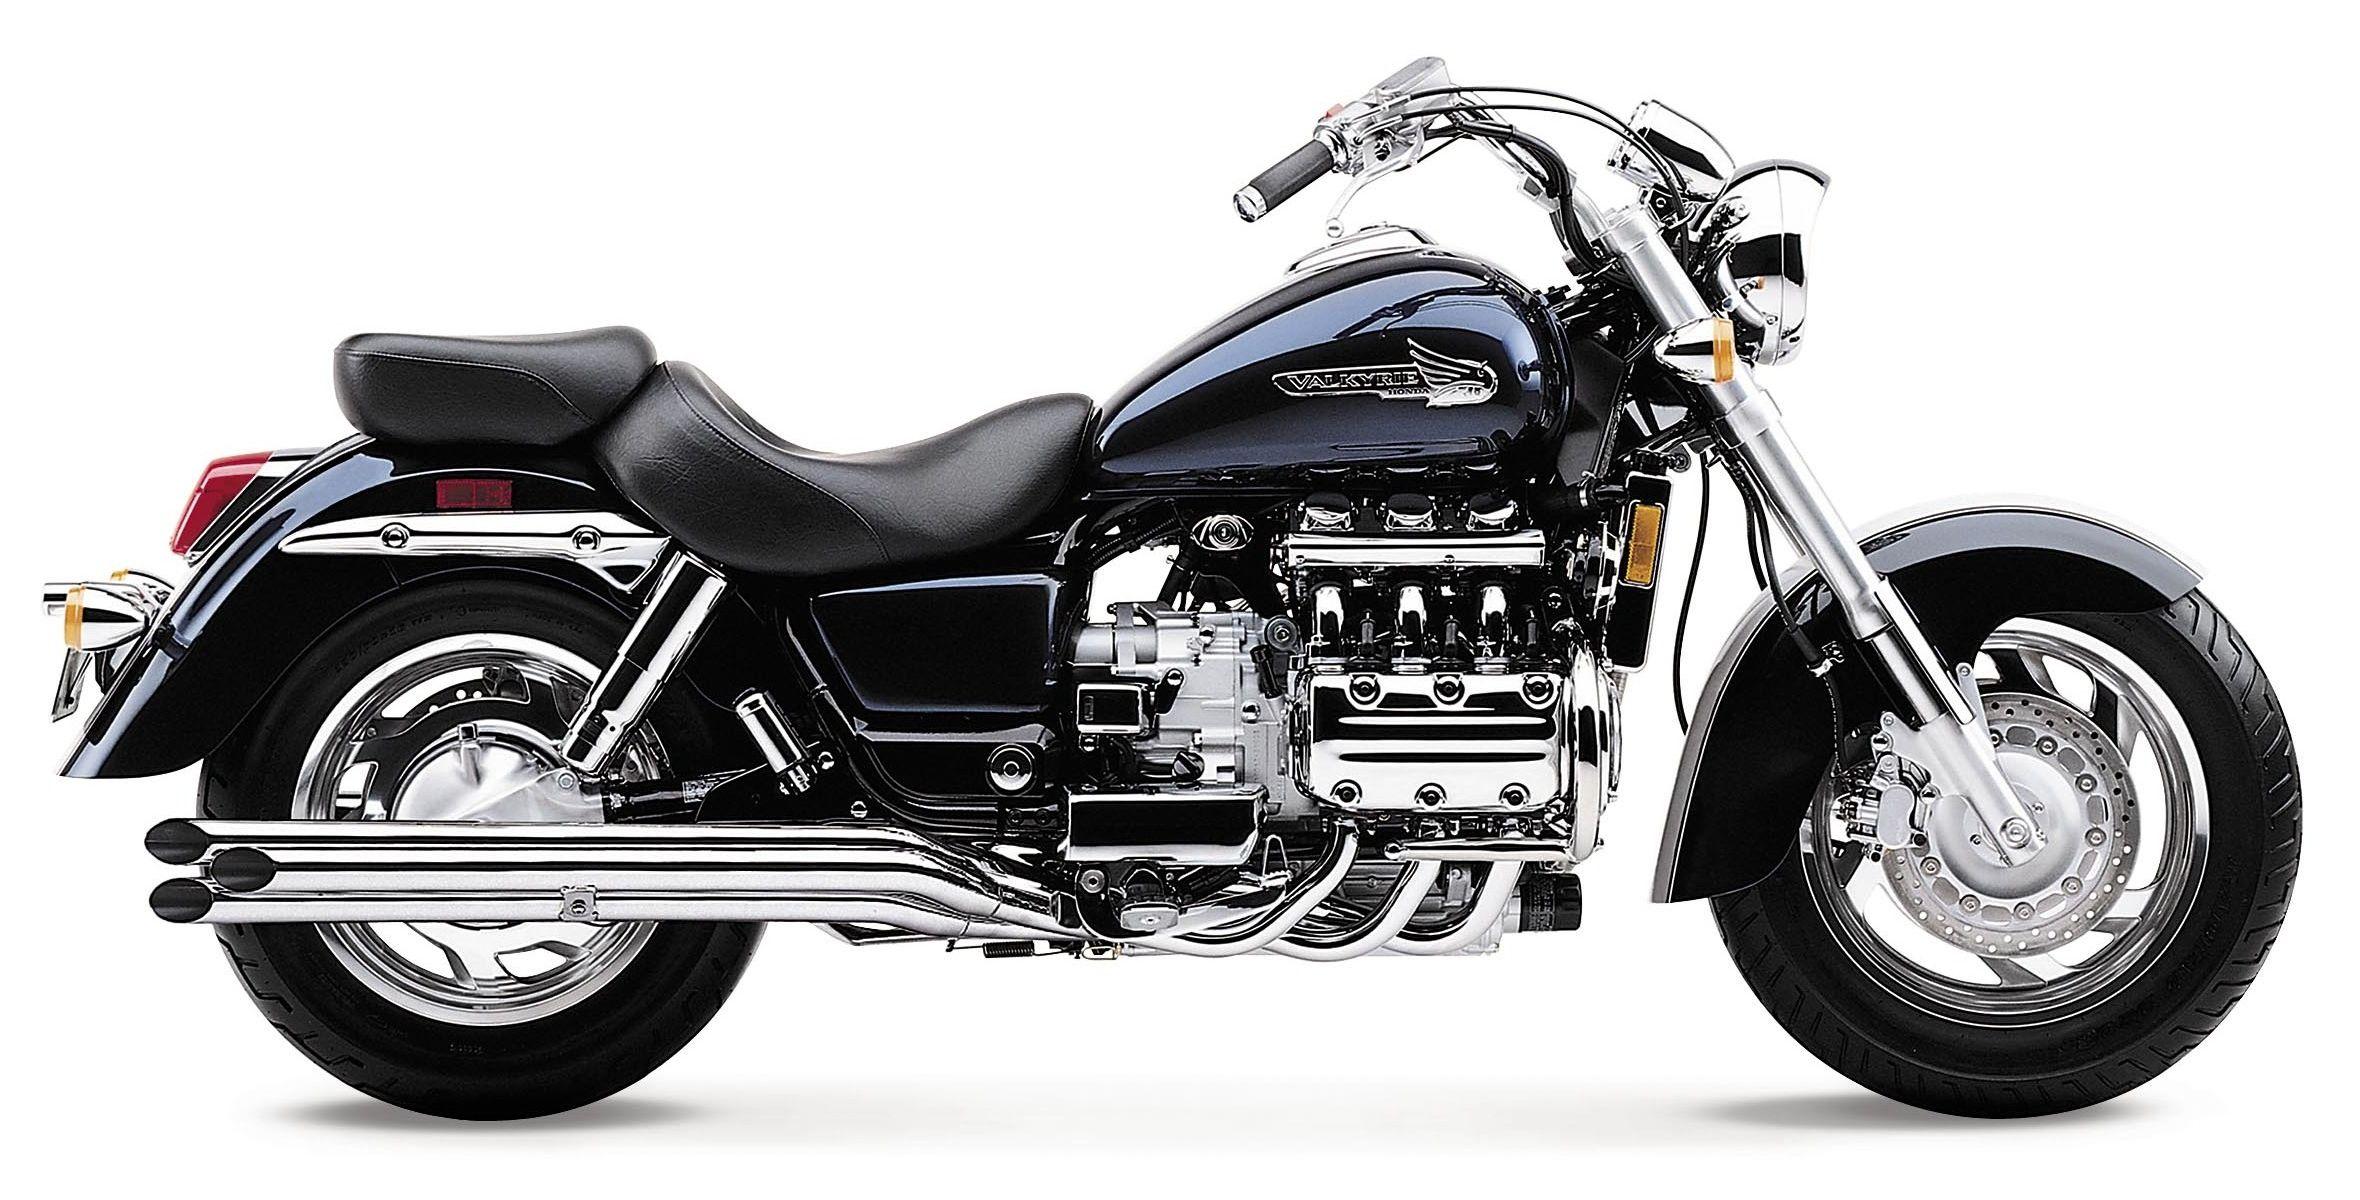 Cobra Boulevard Drag Pipes Honda Valkyrie Gl1500c 10